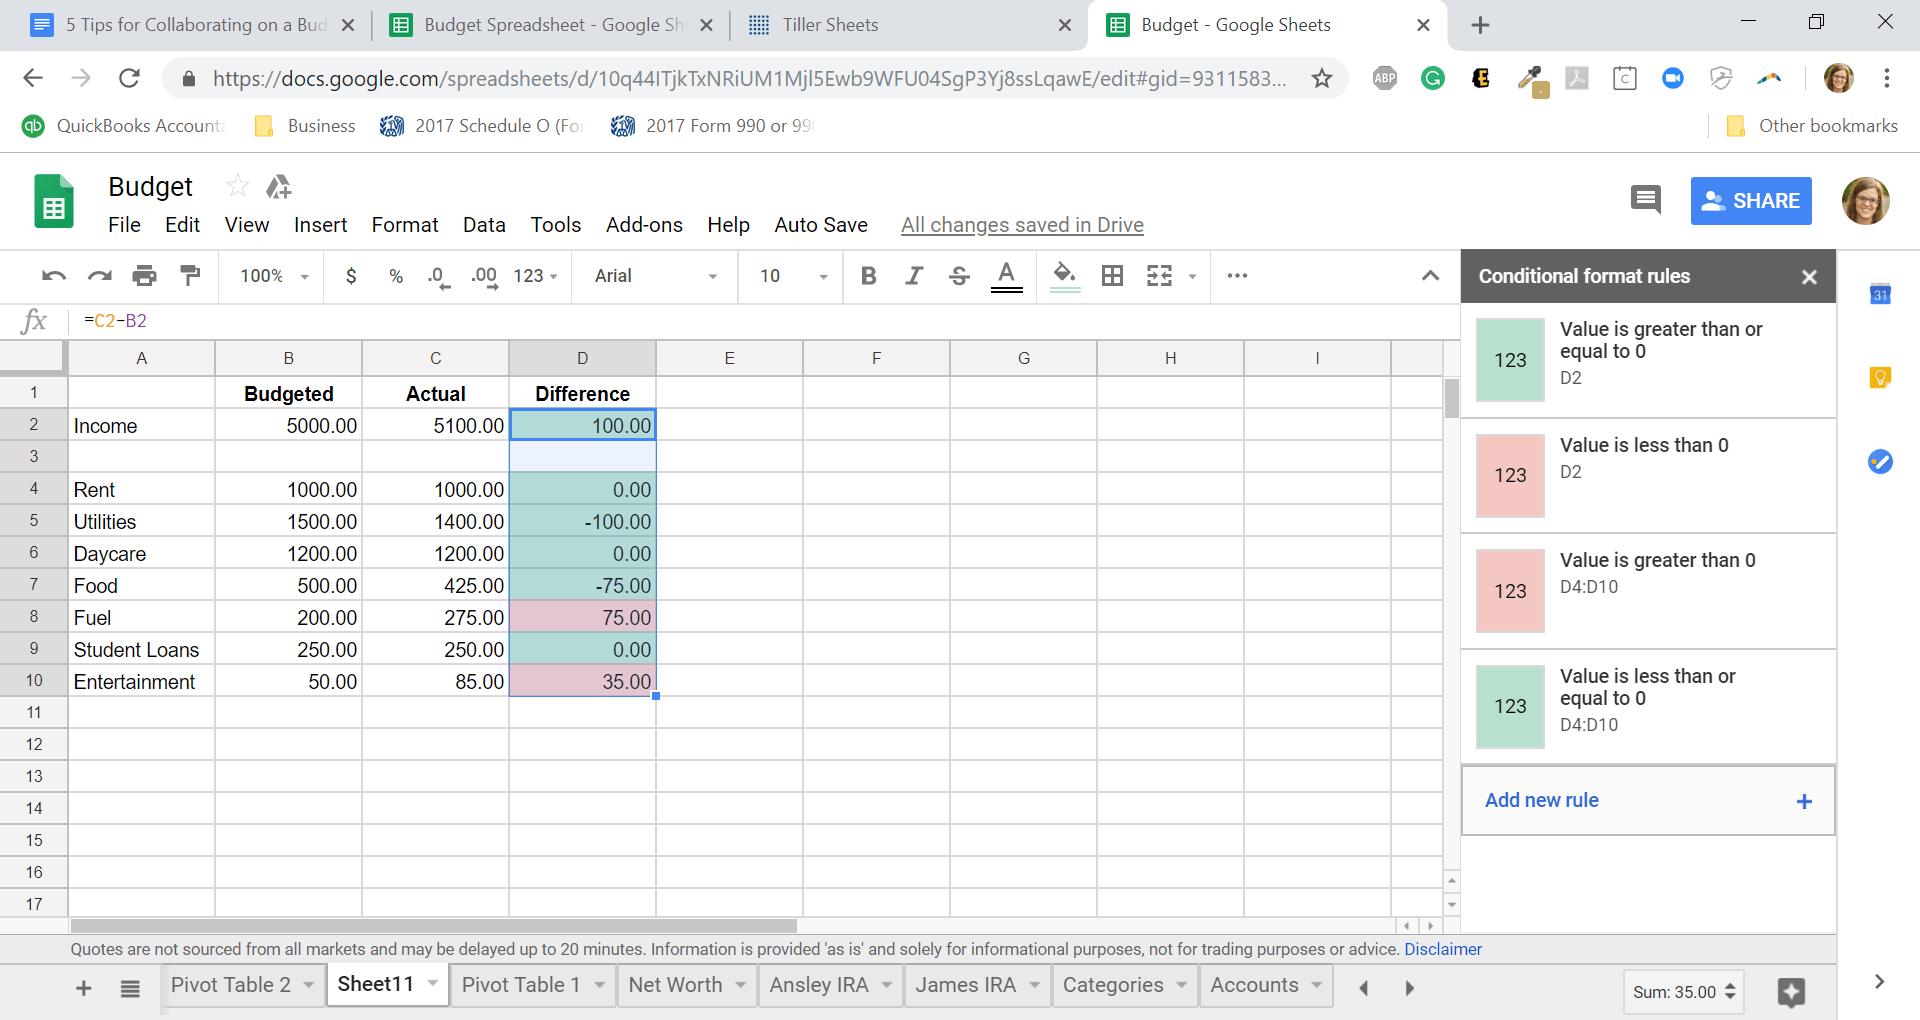 Budget in shared Google Spreadsheet